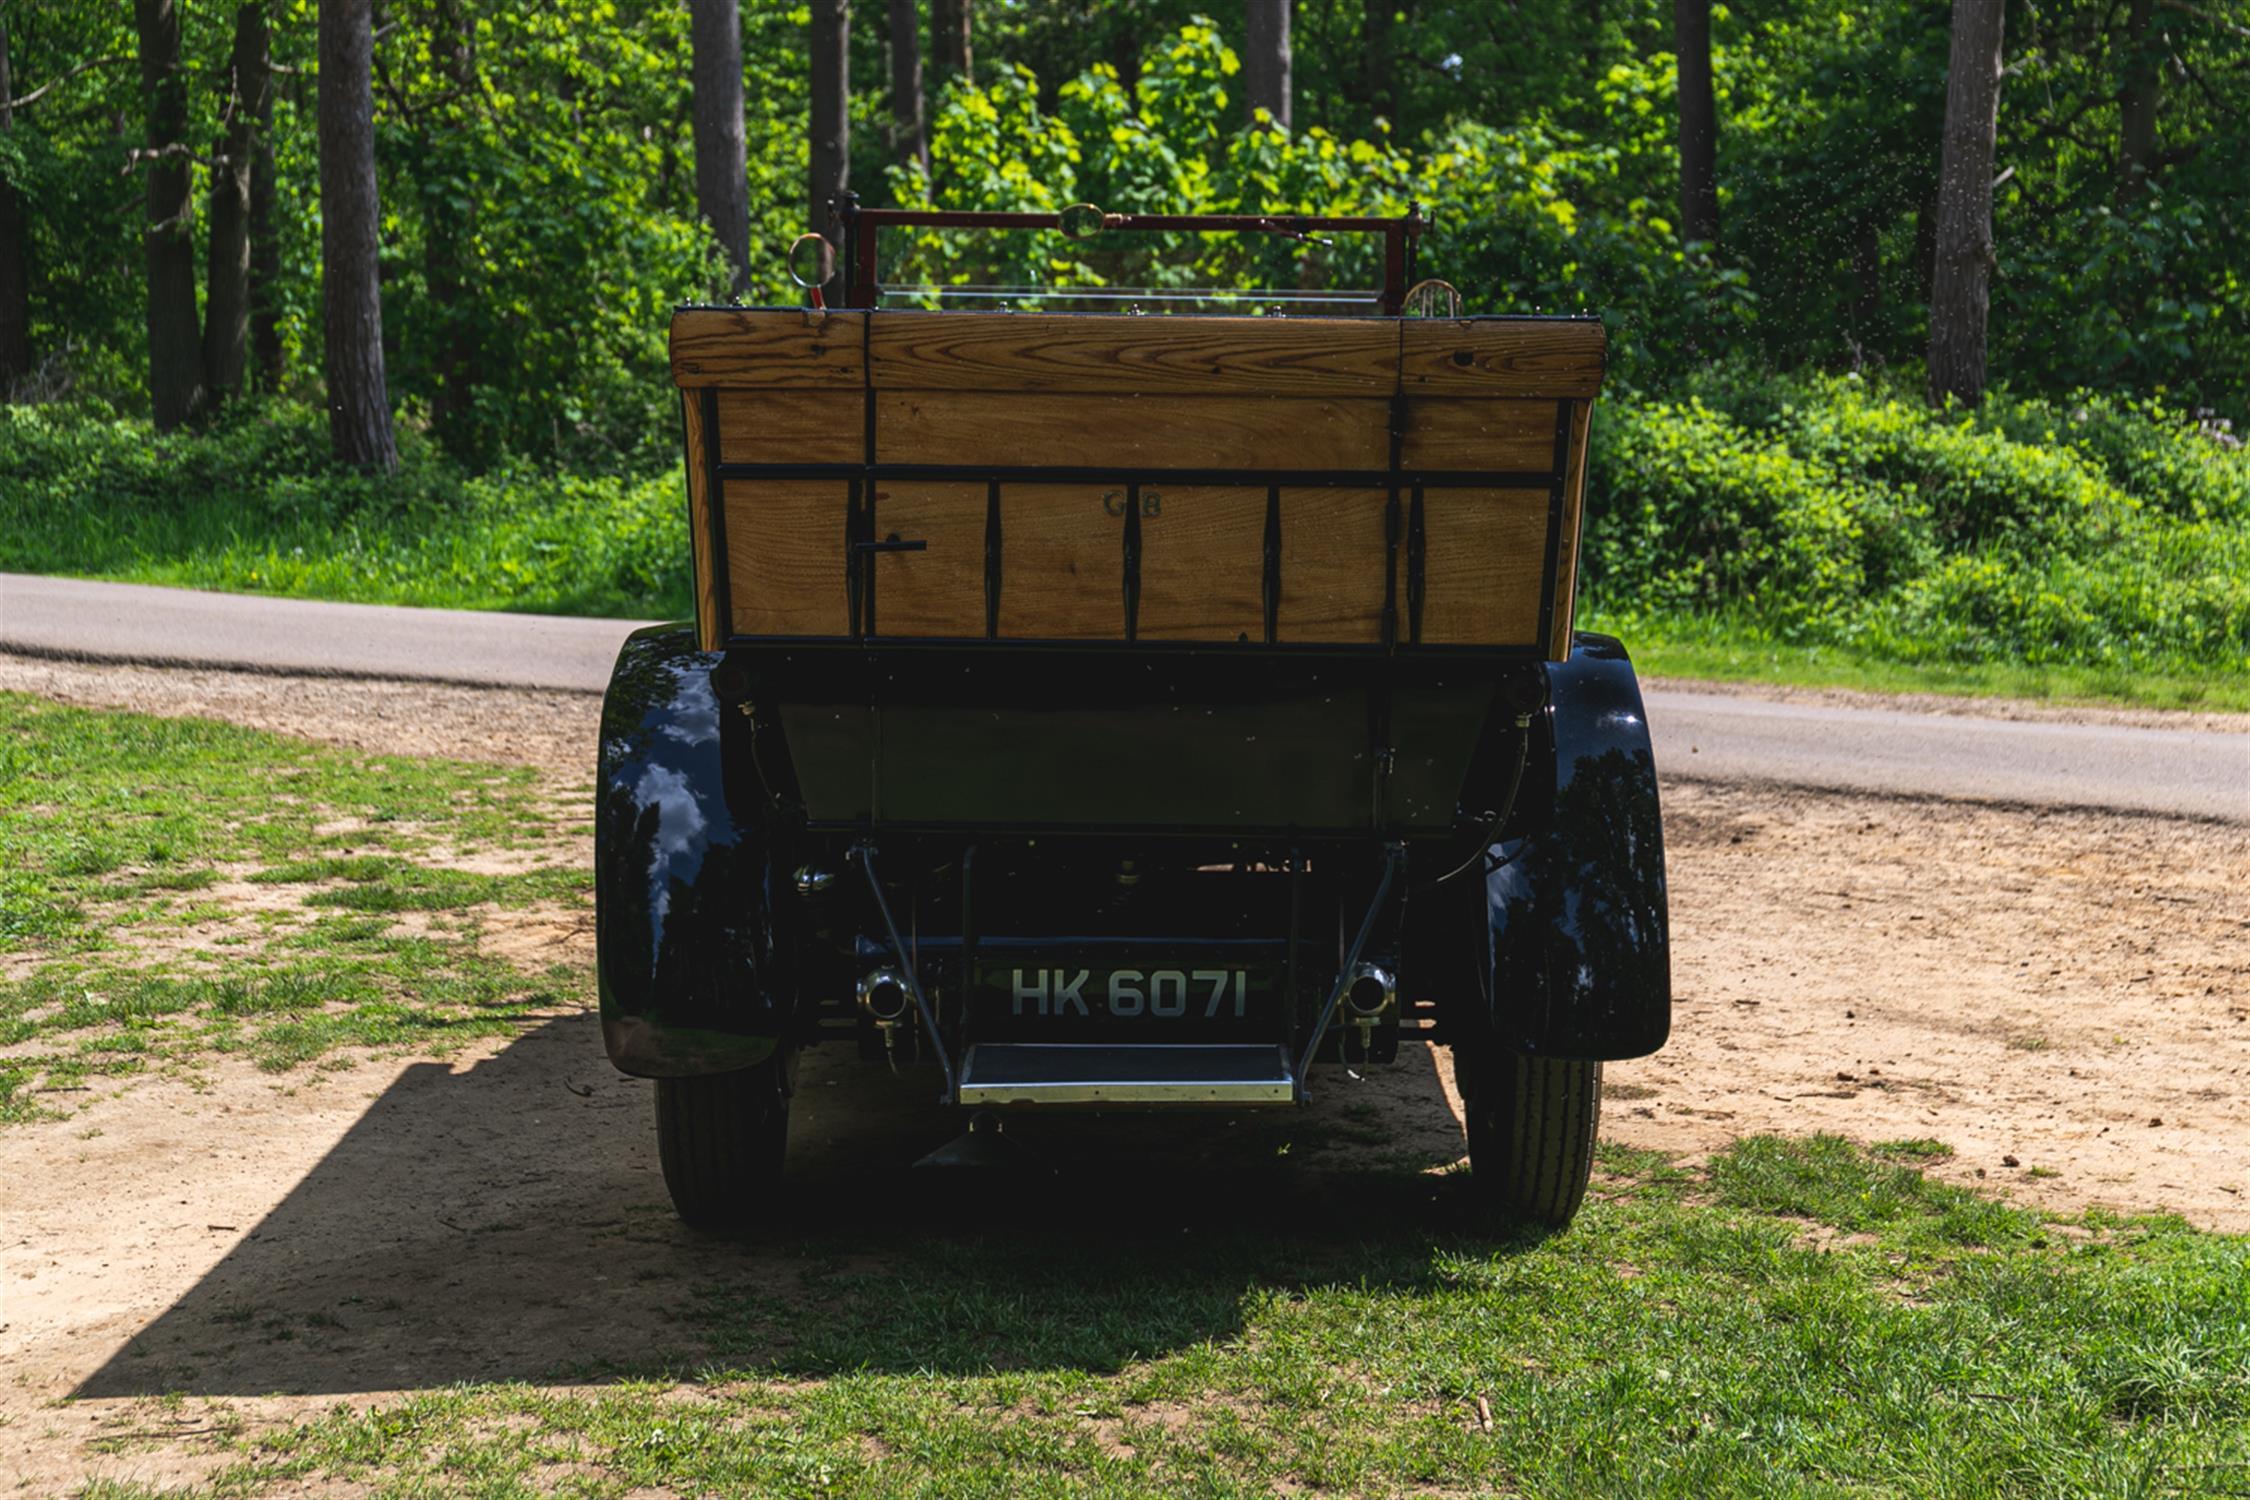 1927 Rolls-Royce Phantom 1 Open Tourer - Image 7 of 10